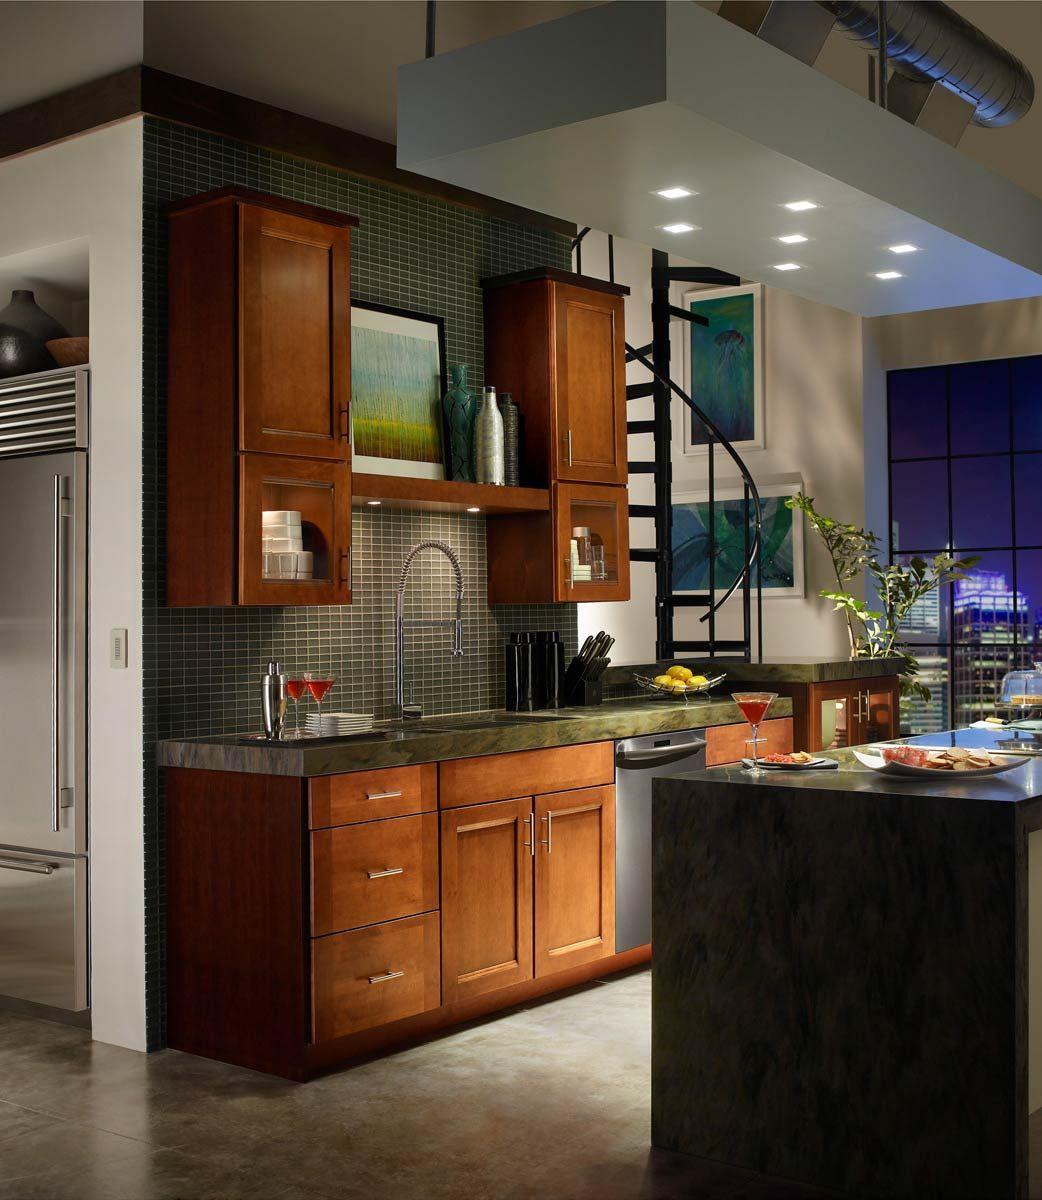 waypoint living spaces style 420 in maple auburn glaze glazed kitchen cabinets kitchen on kitchen interior small space id=87187